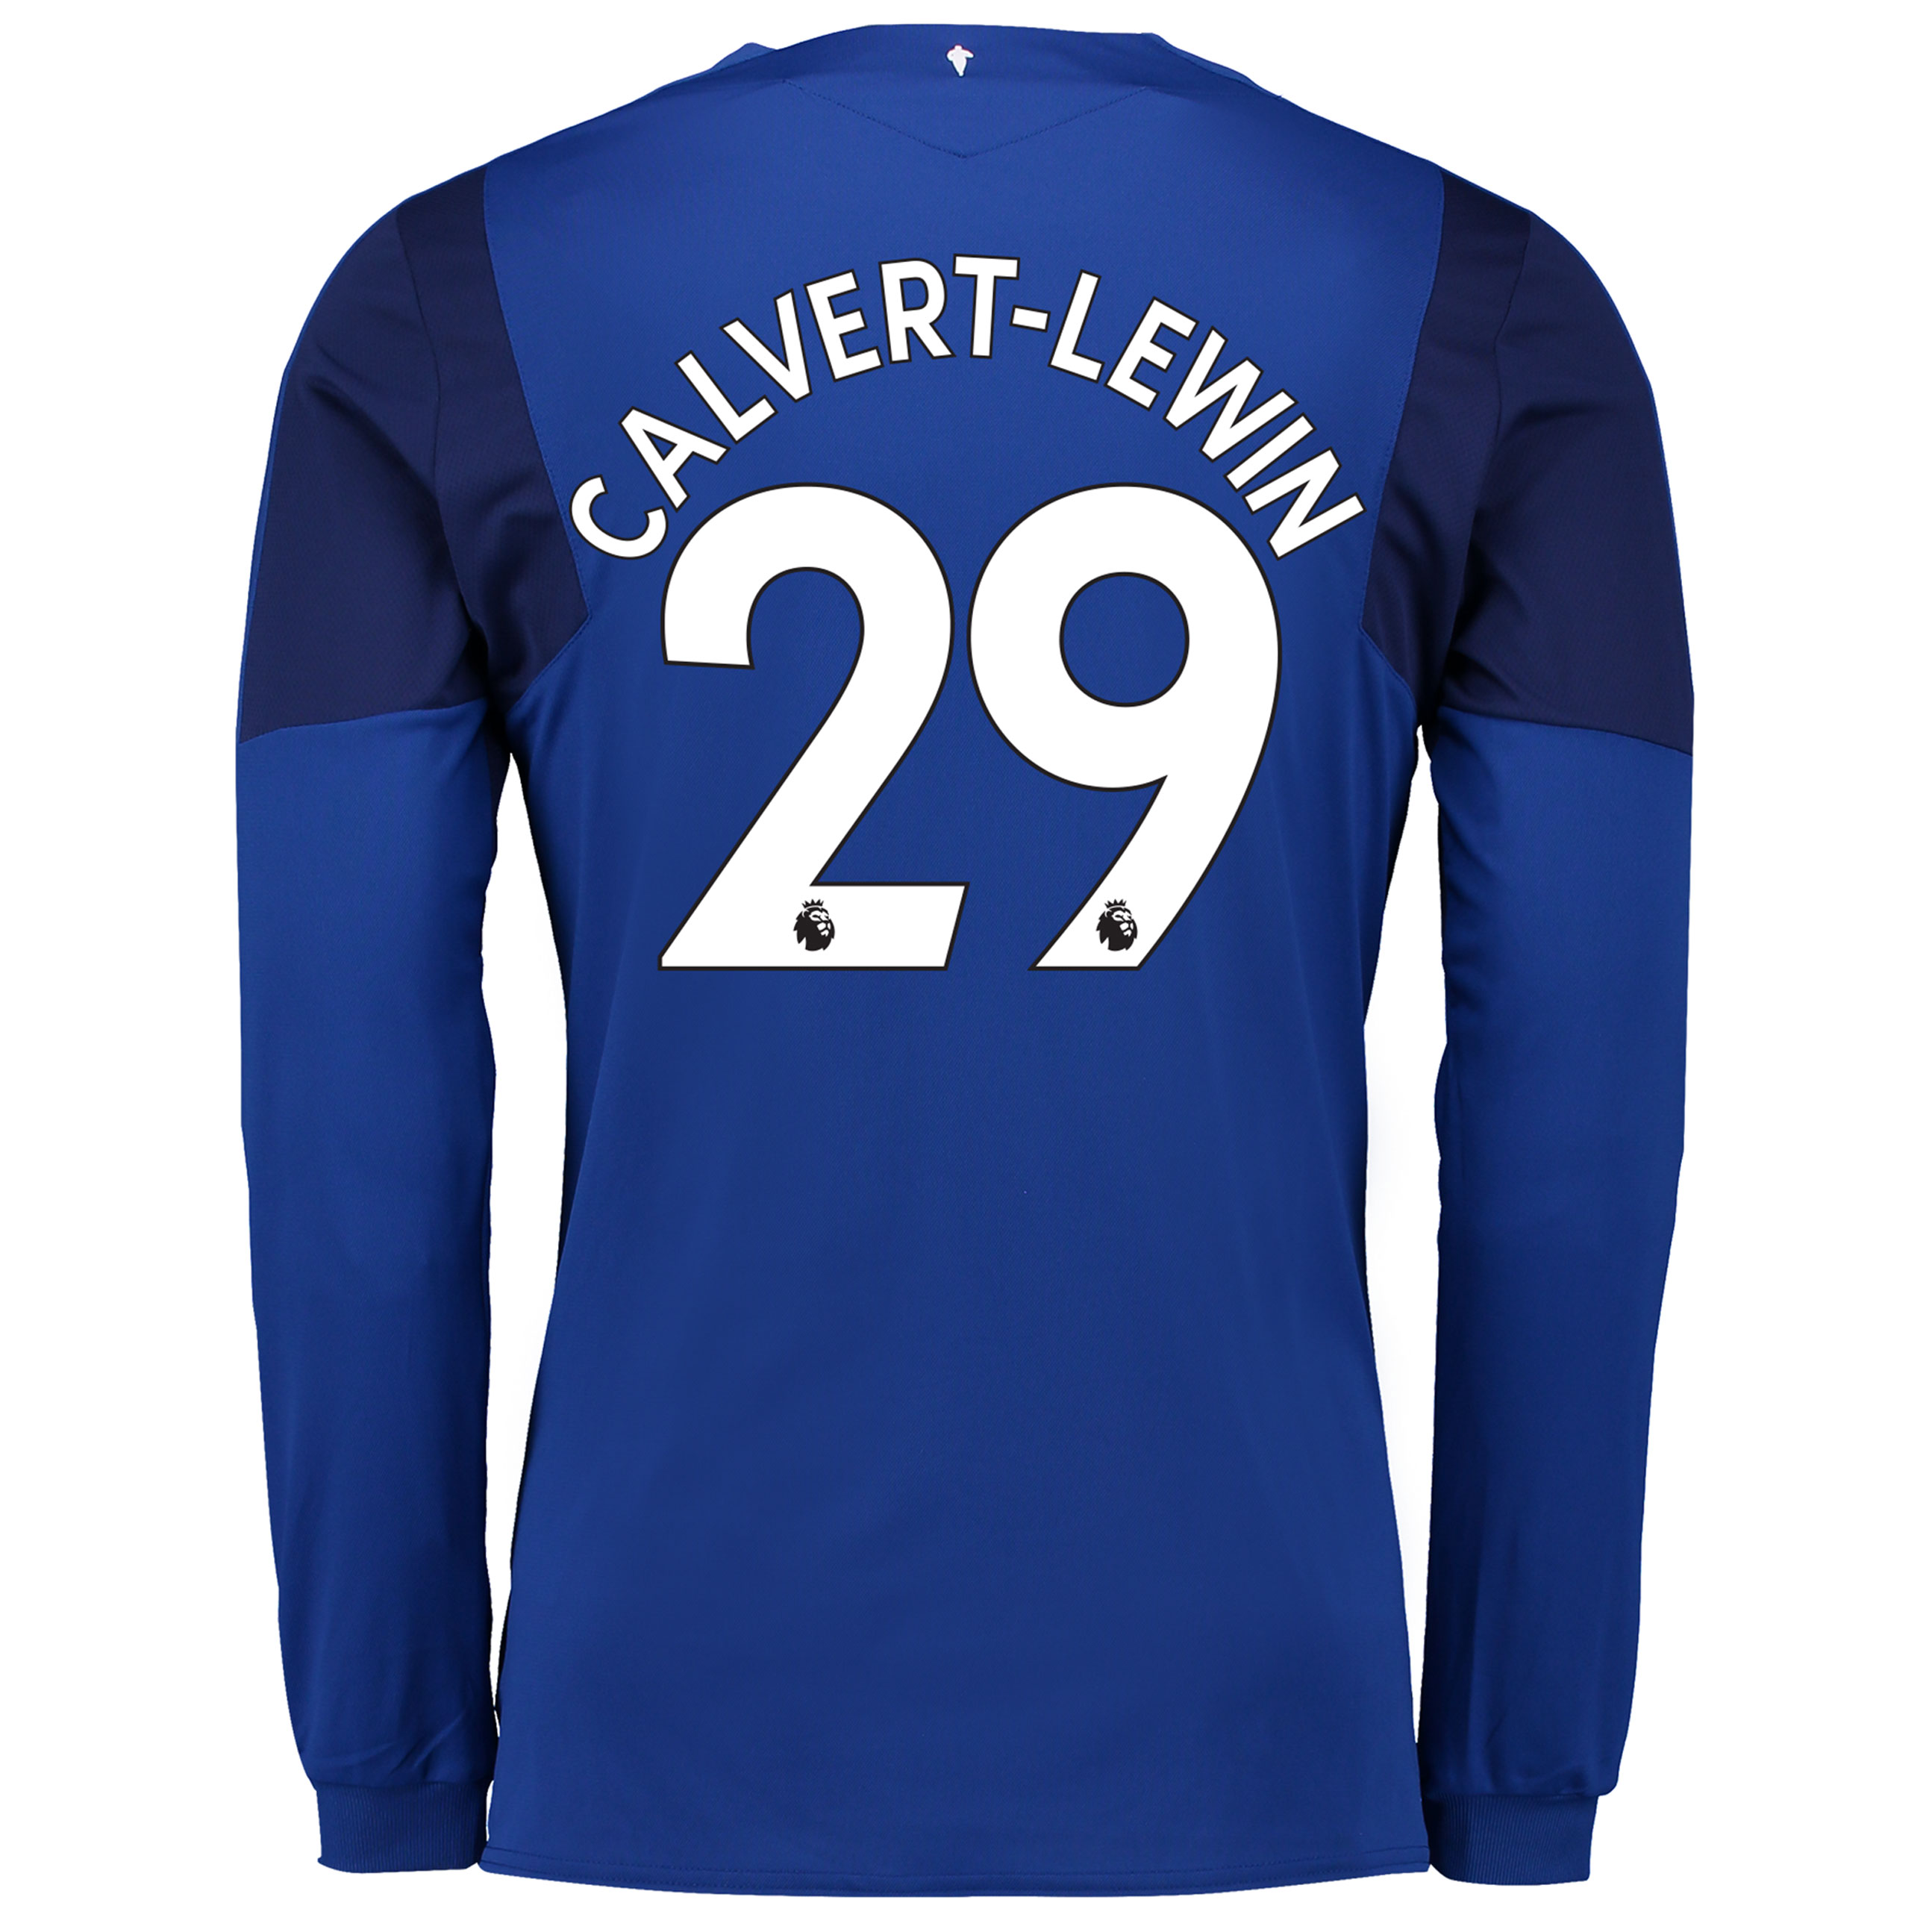 Everton Home Shirt 2017/18 - Junior - Long Sleeved with Calvert-Lewin